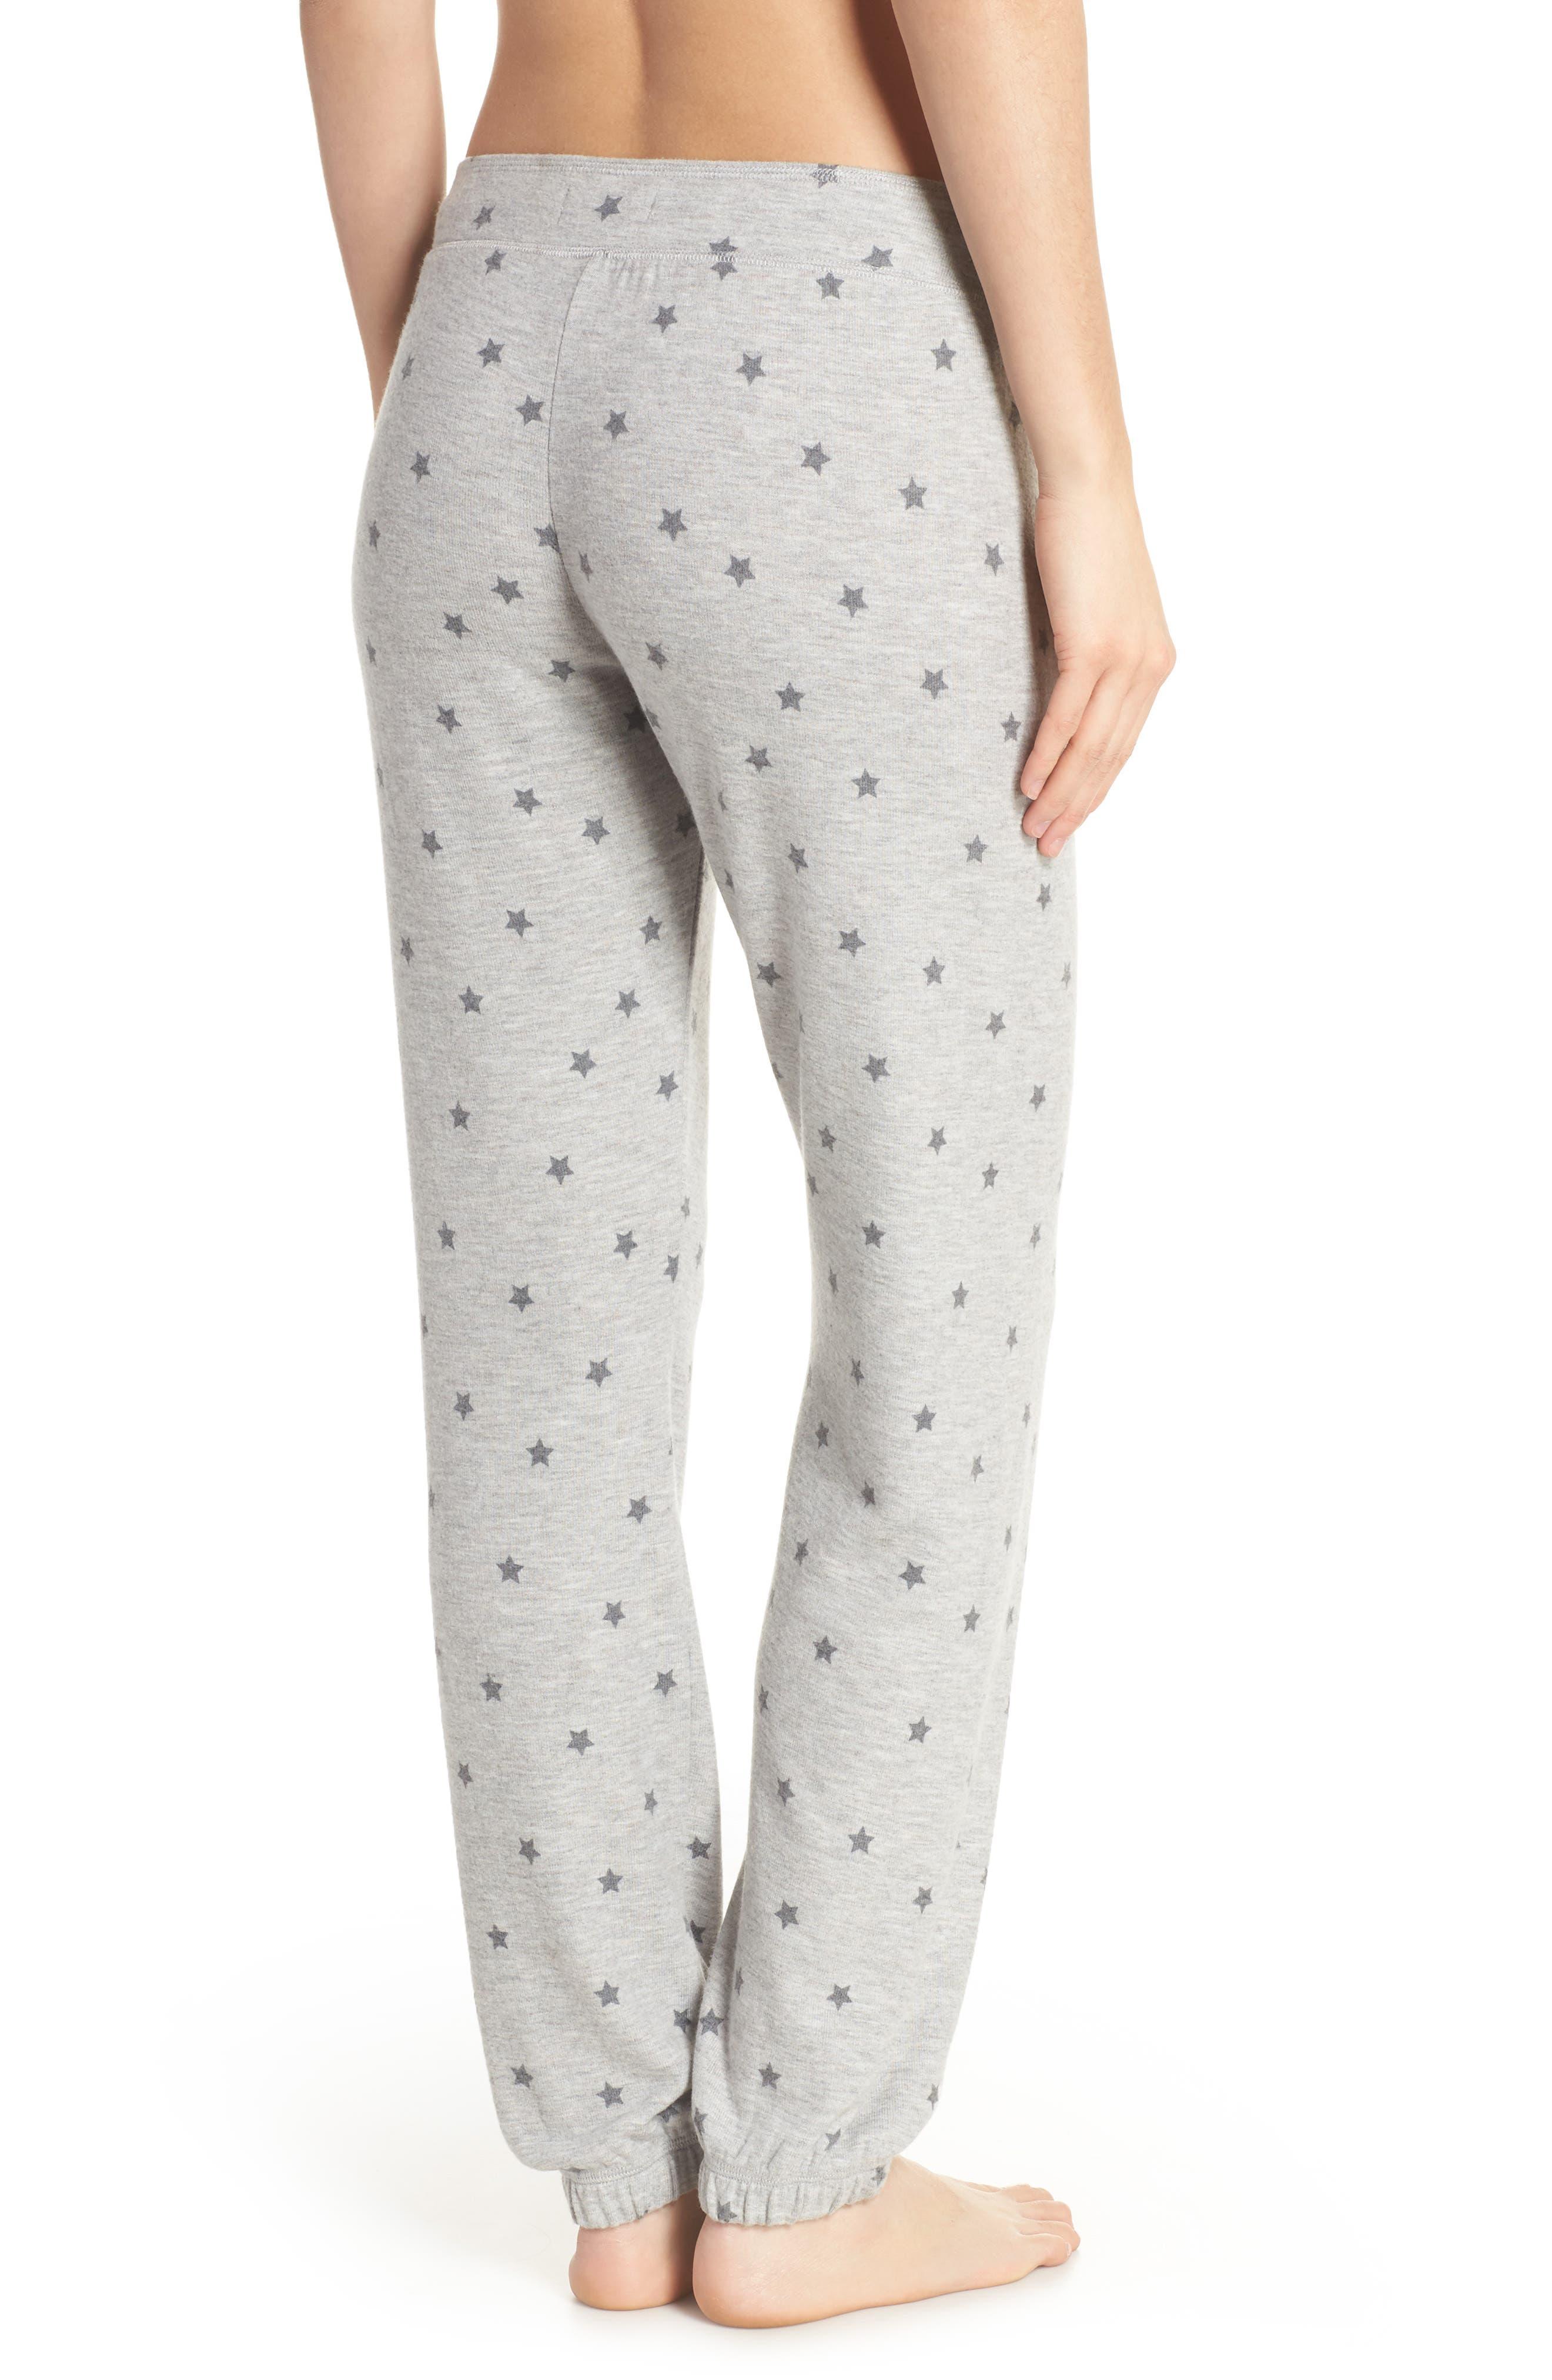 Peachy Pajama Pants,                             Alternate thumbnail 2, color,                             020